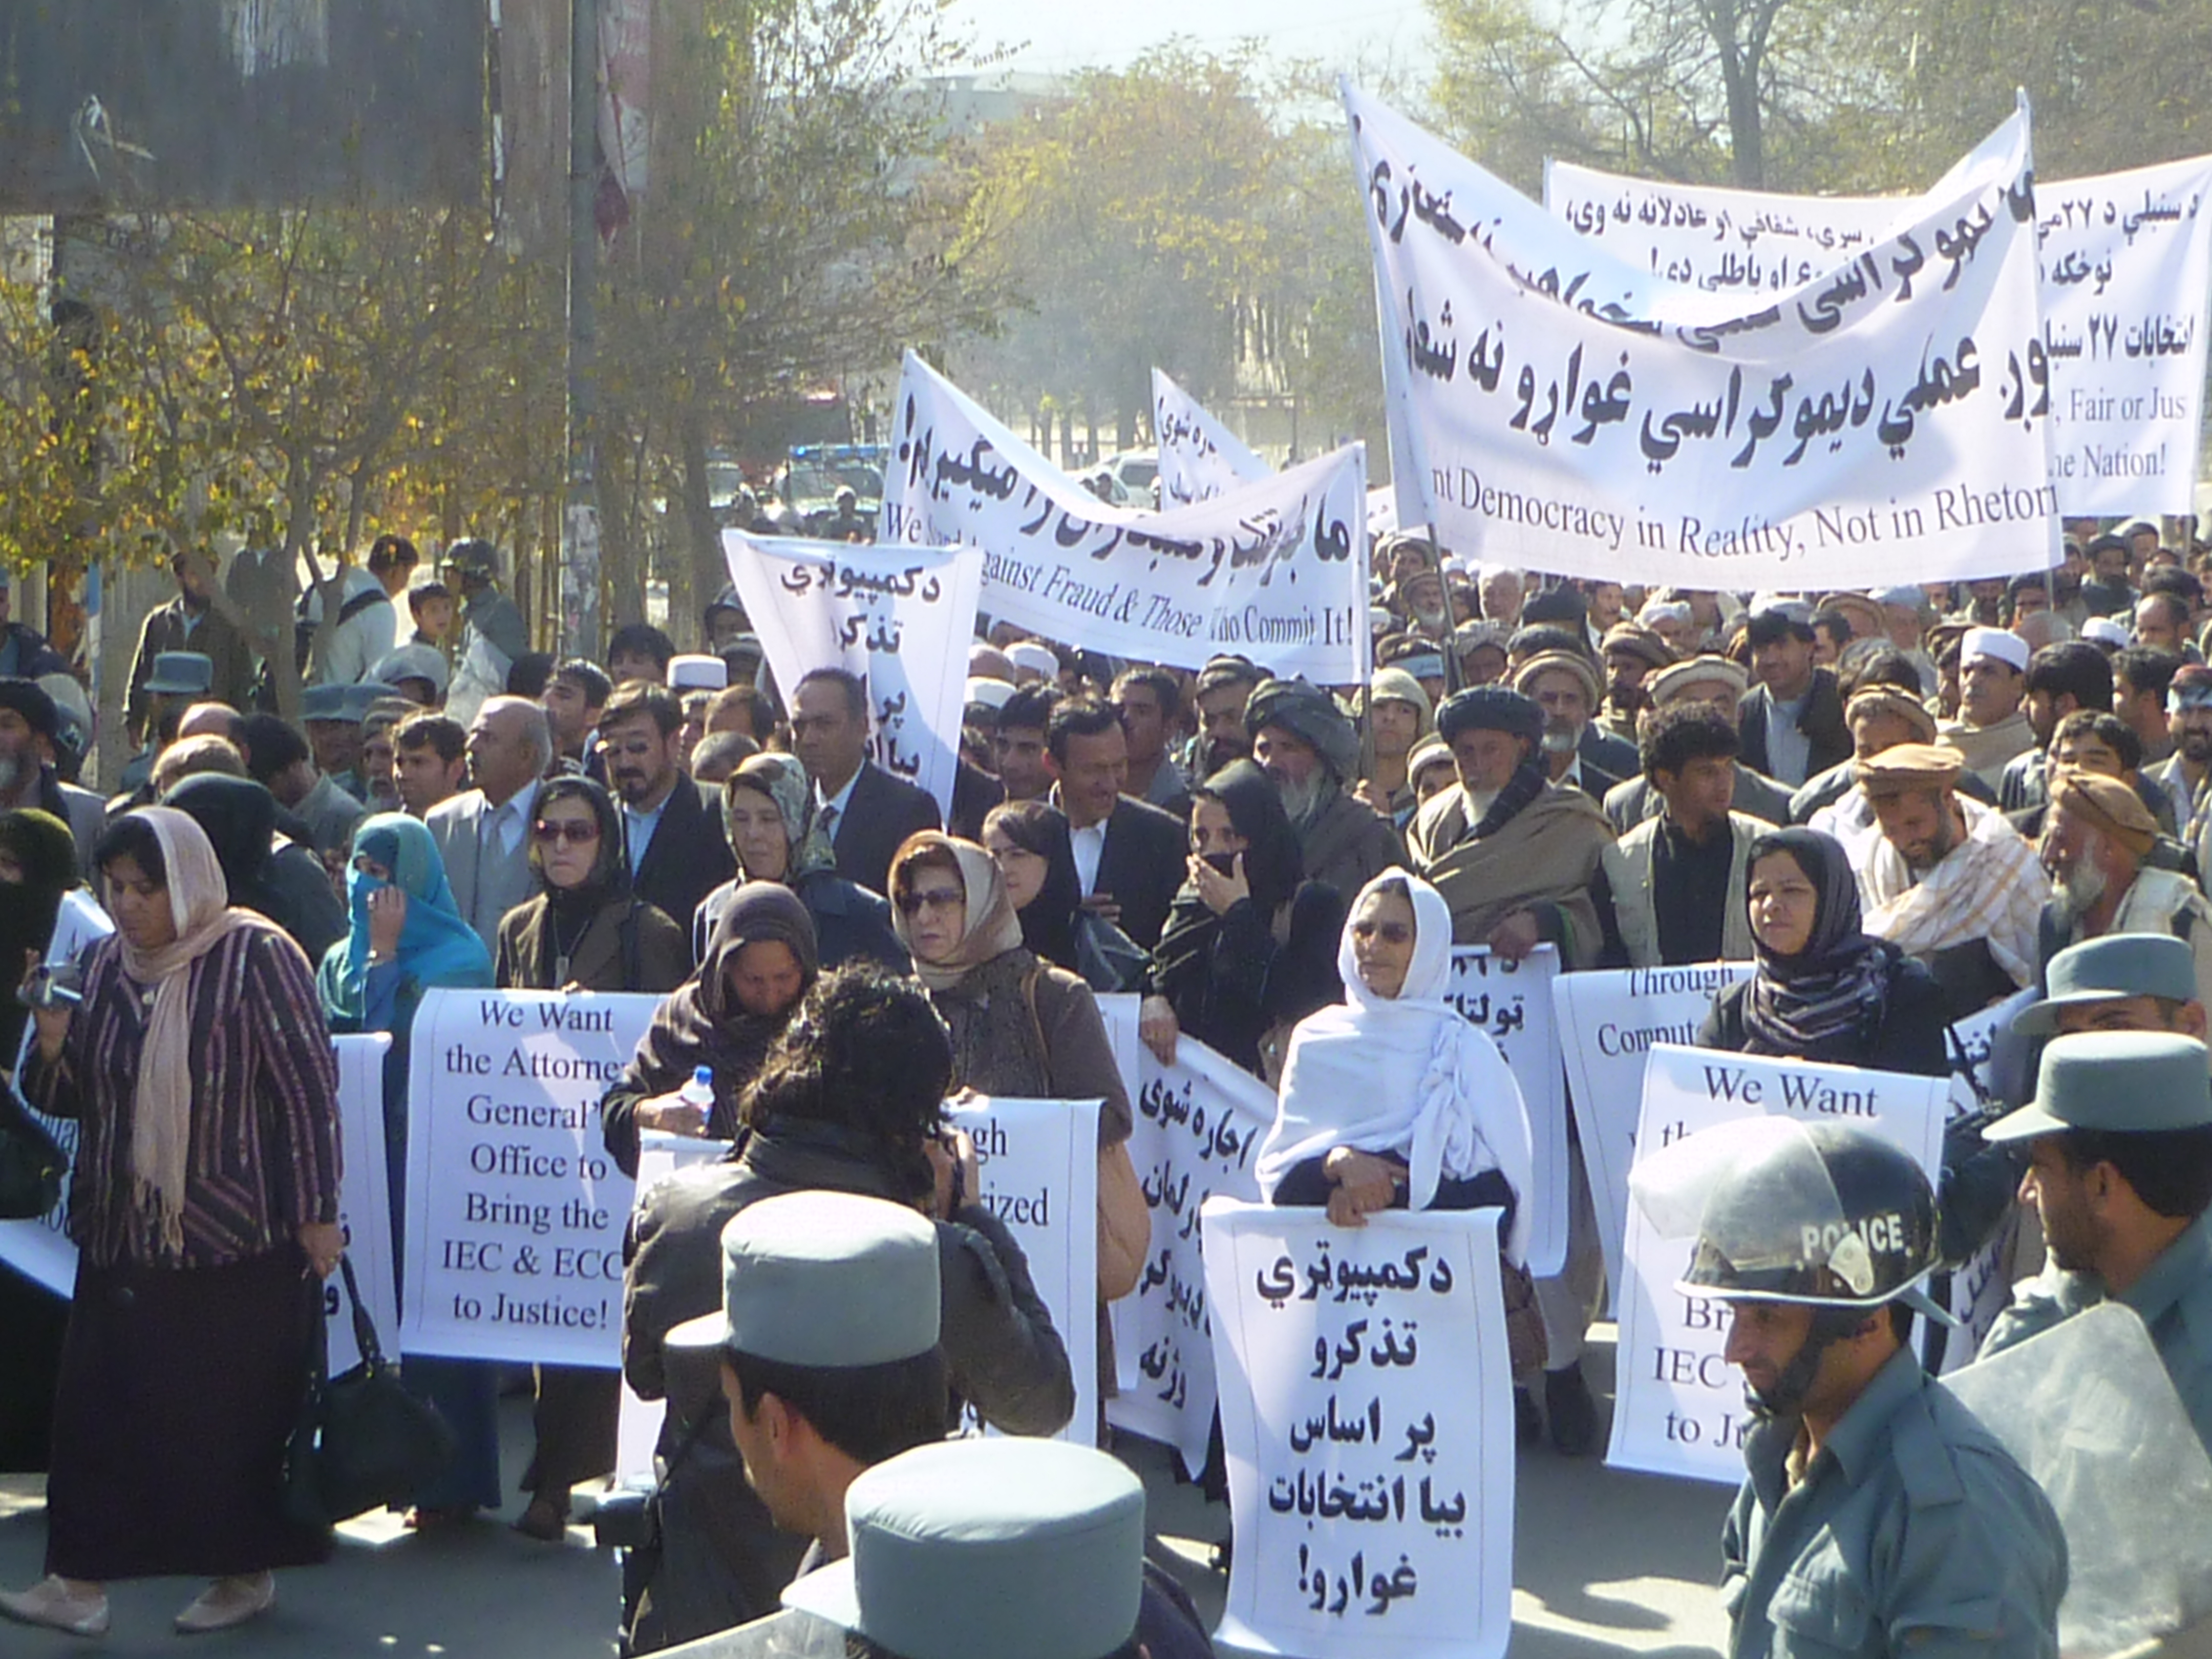 Pro-Demokratie-Demo in Kabul demo 2013. Foto: Obaid Ali/AAN, 2013.